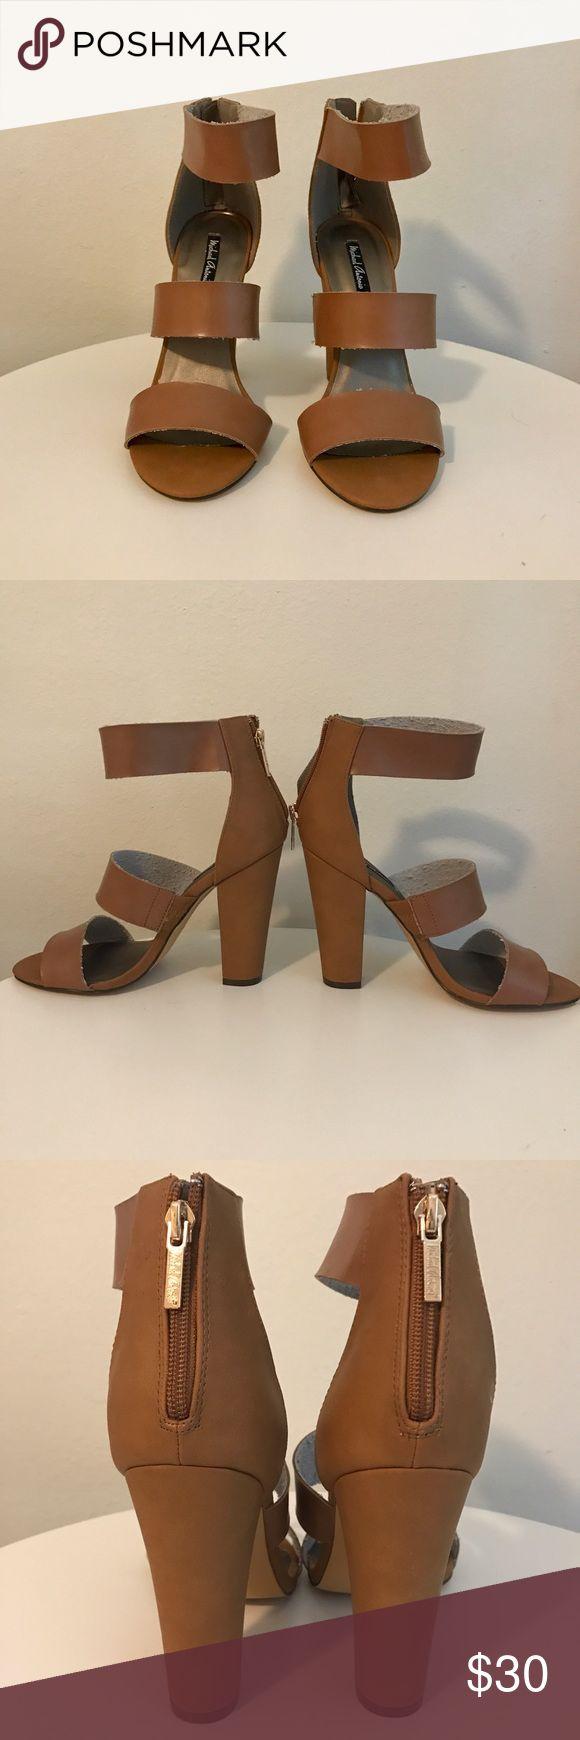 "NWOT brown heeled sandals NWOT never worn!! Opened toe heel sandals. Size 9 in whisky brown. About 4"" heel. Gold Zip up backs. Michael Antonio Shoes Heels"